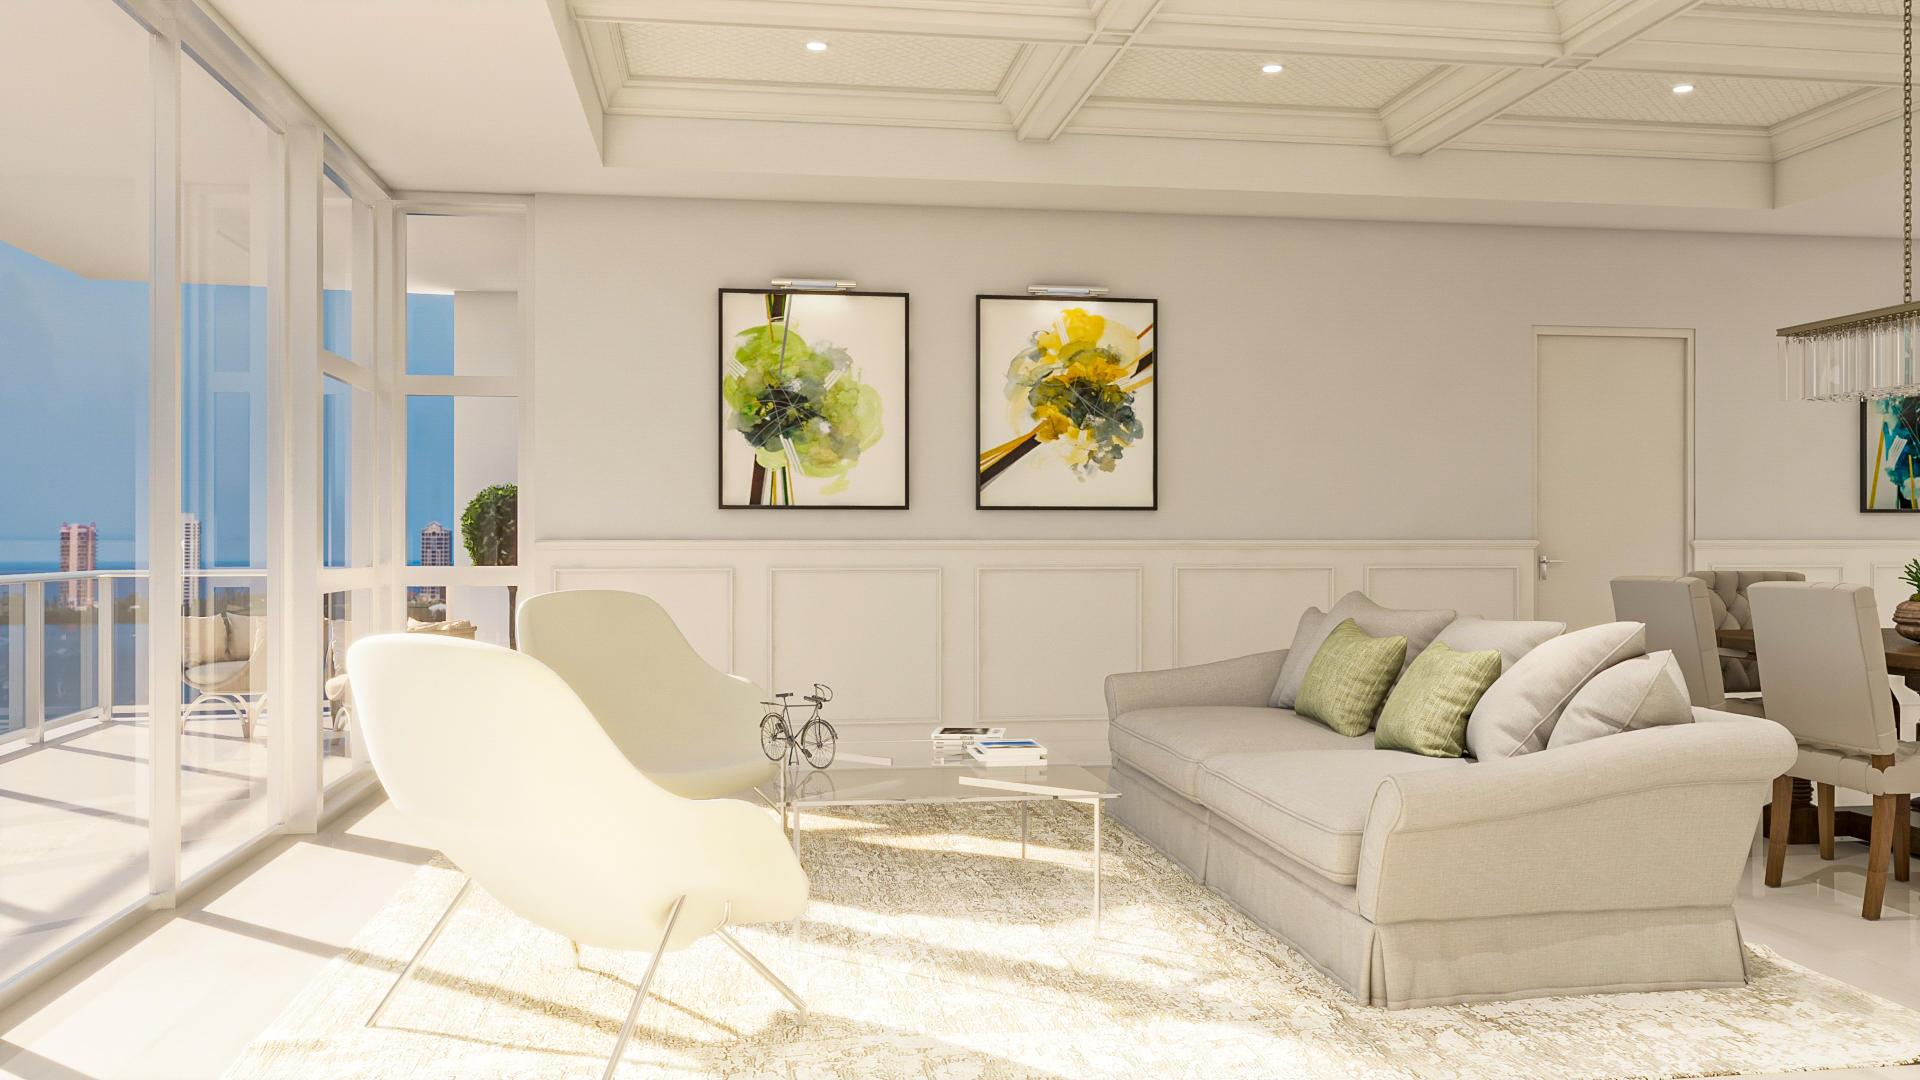 N220_Unit A.03_cam003_Living Room001